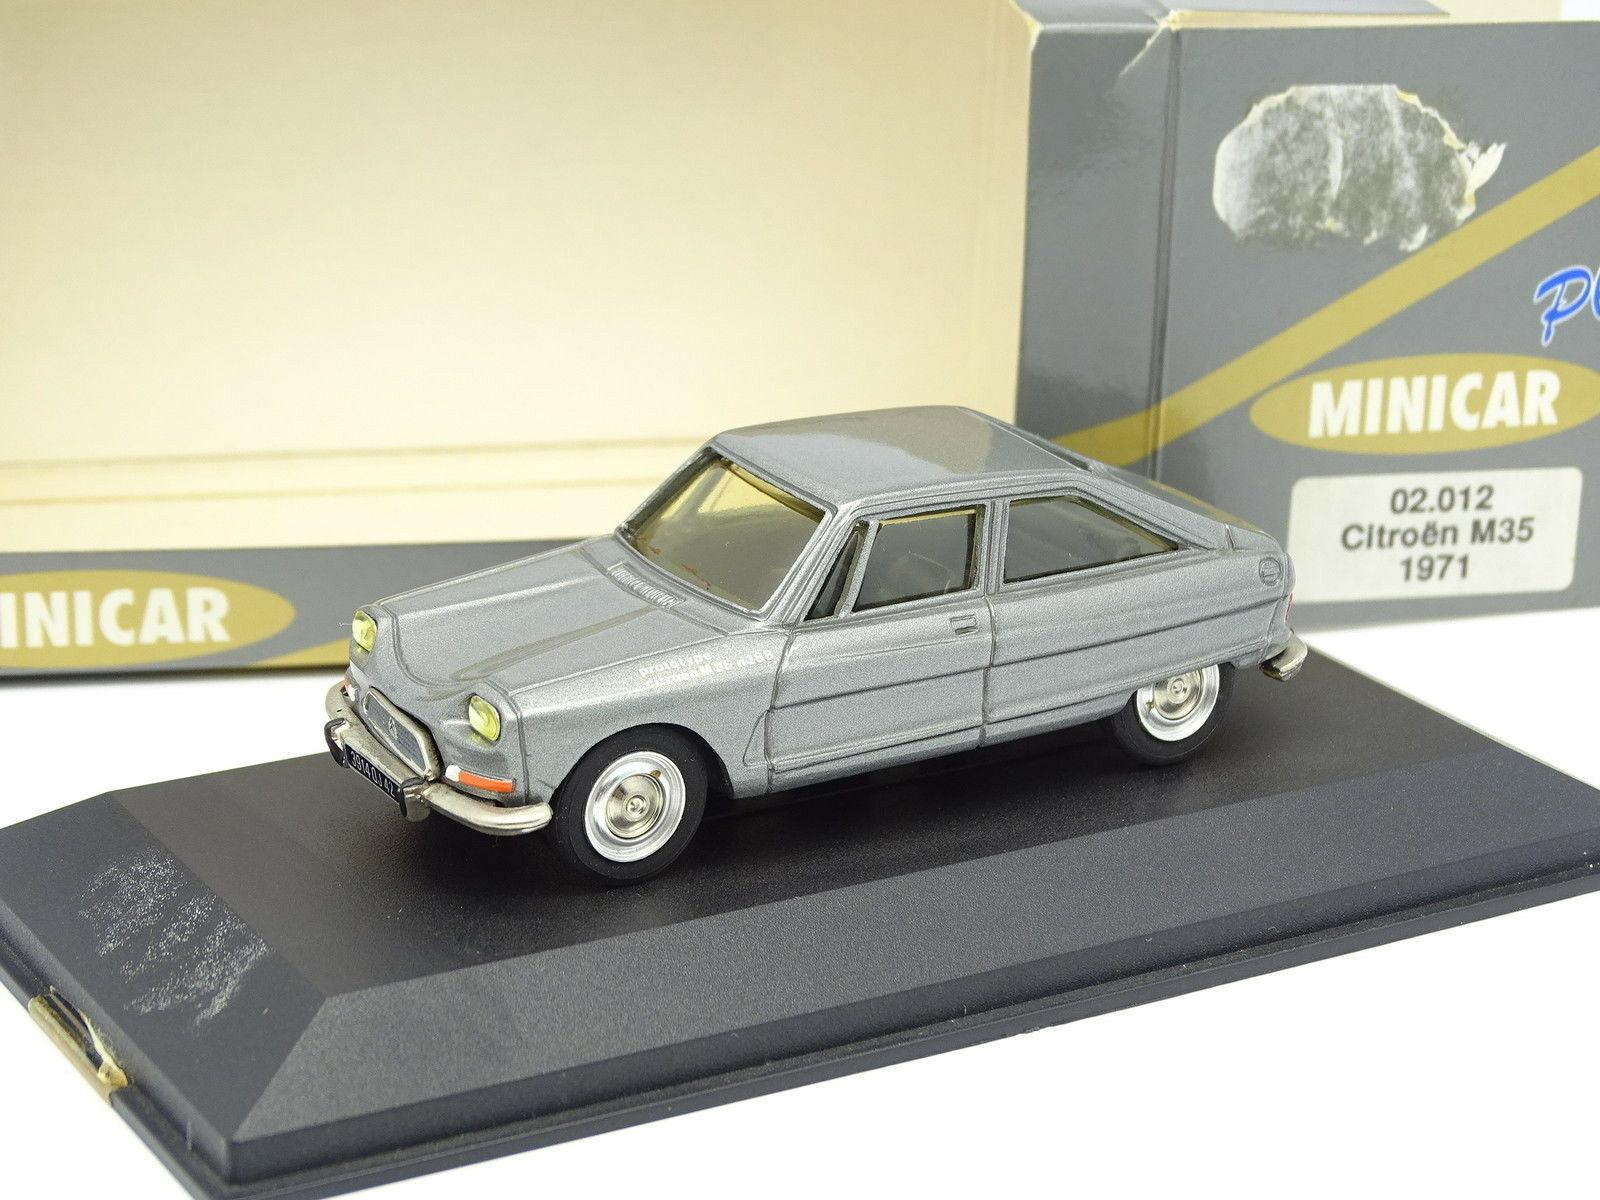 Minicar Plus 1/43 - Citroen AMI 8 Prototype M35 1975